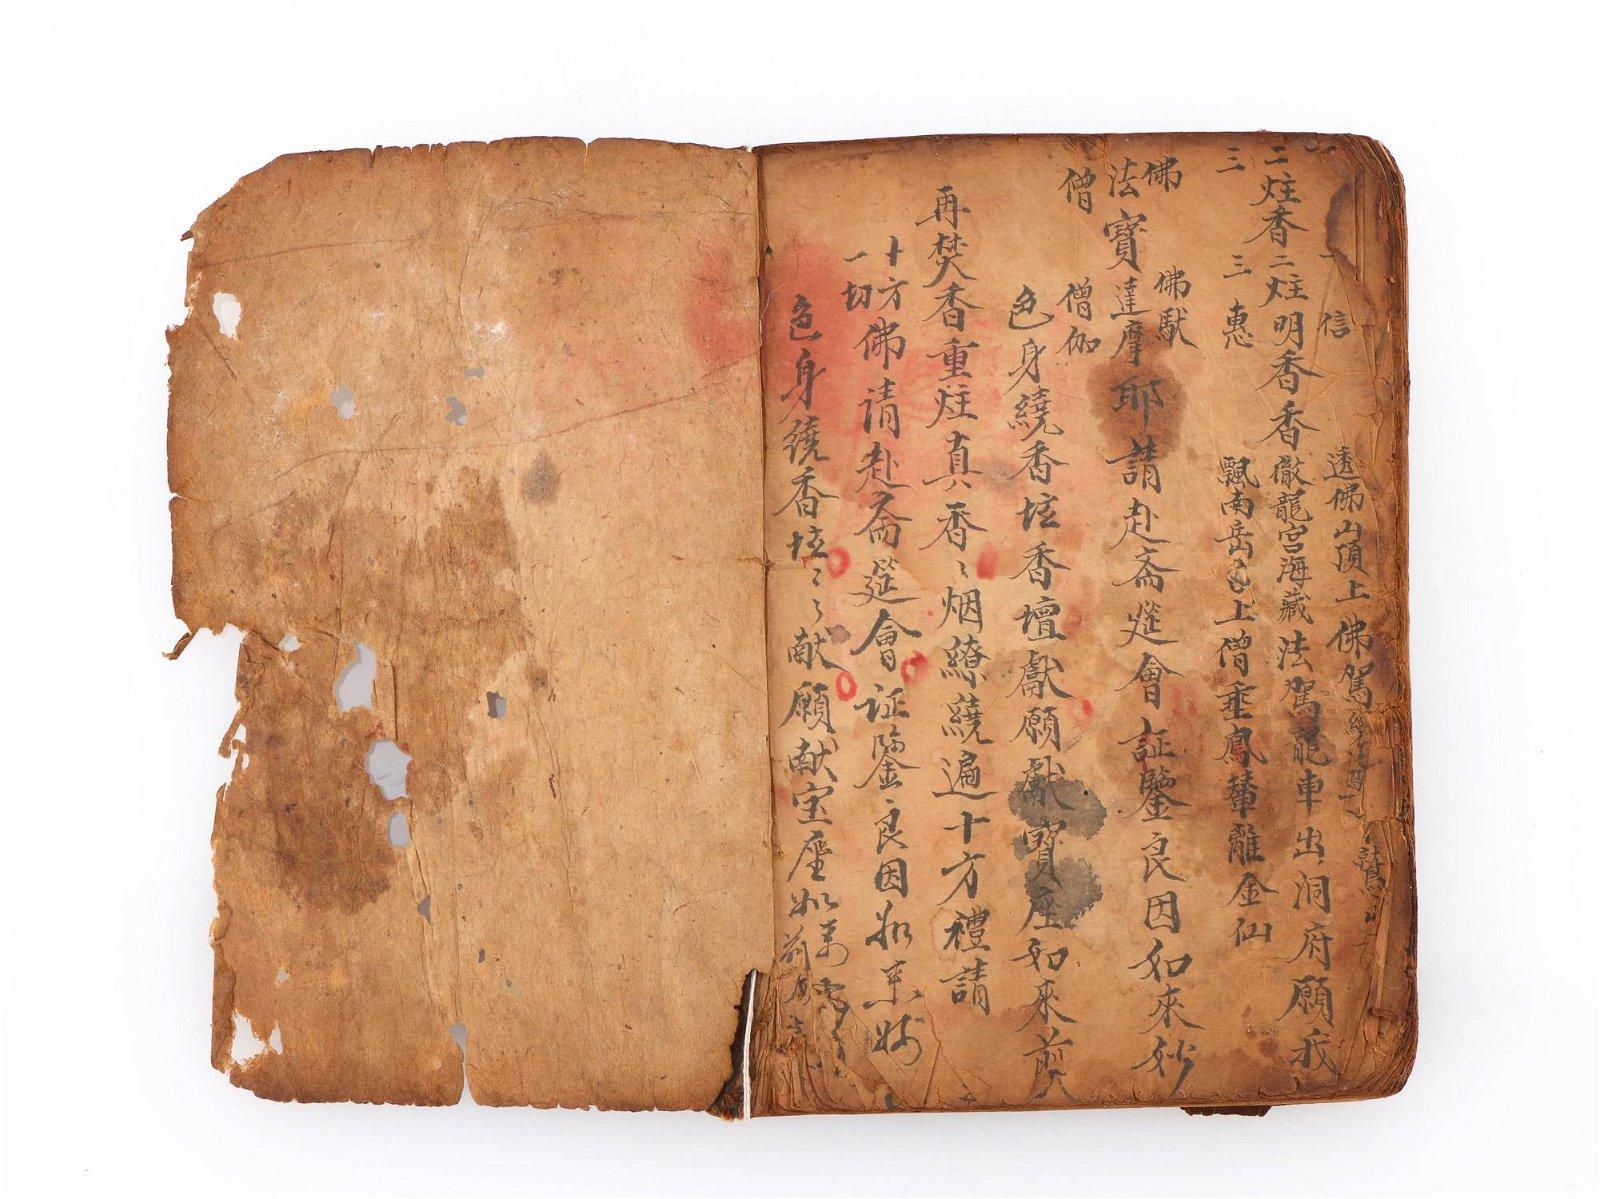 Antique Chinese Handwritten Book on Handmade Paper